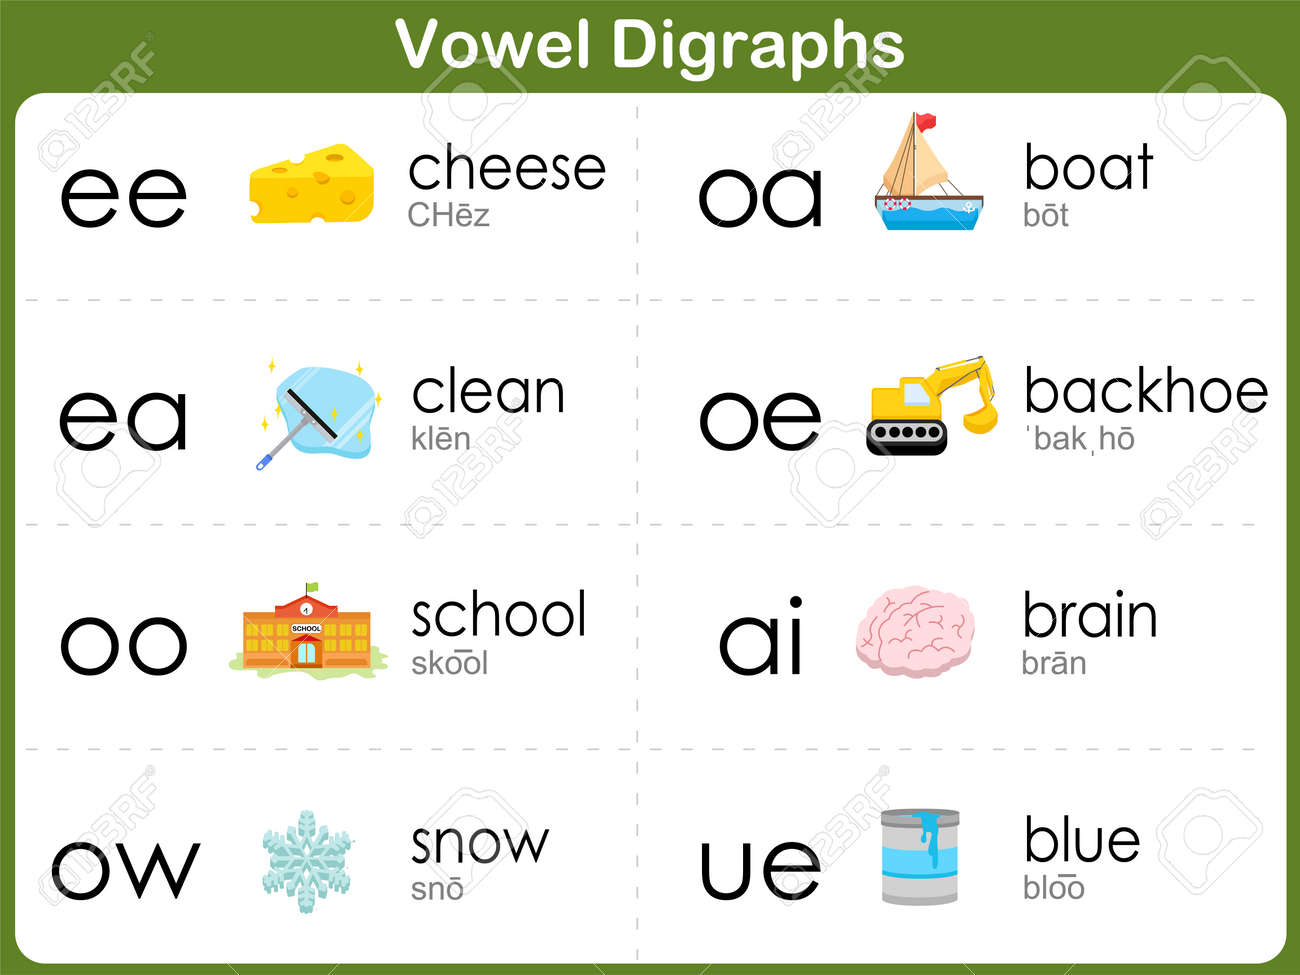 Free Worksheet Digraph Worksheets digraph worksheets rringband vowel rringband